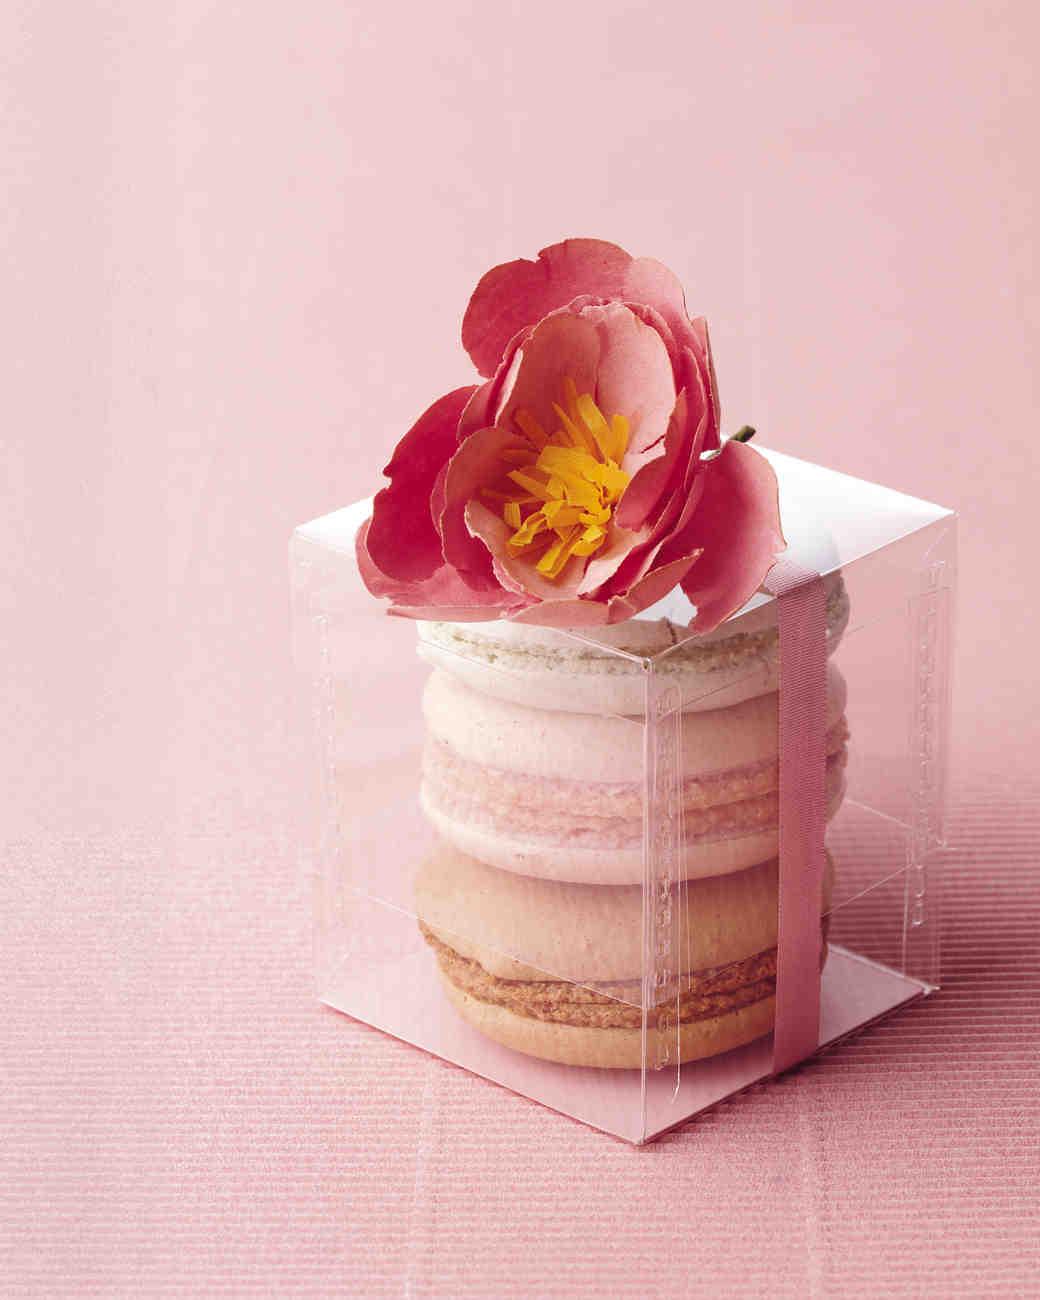 macaron-wed-sp2000-favors-01-0315.jpg